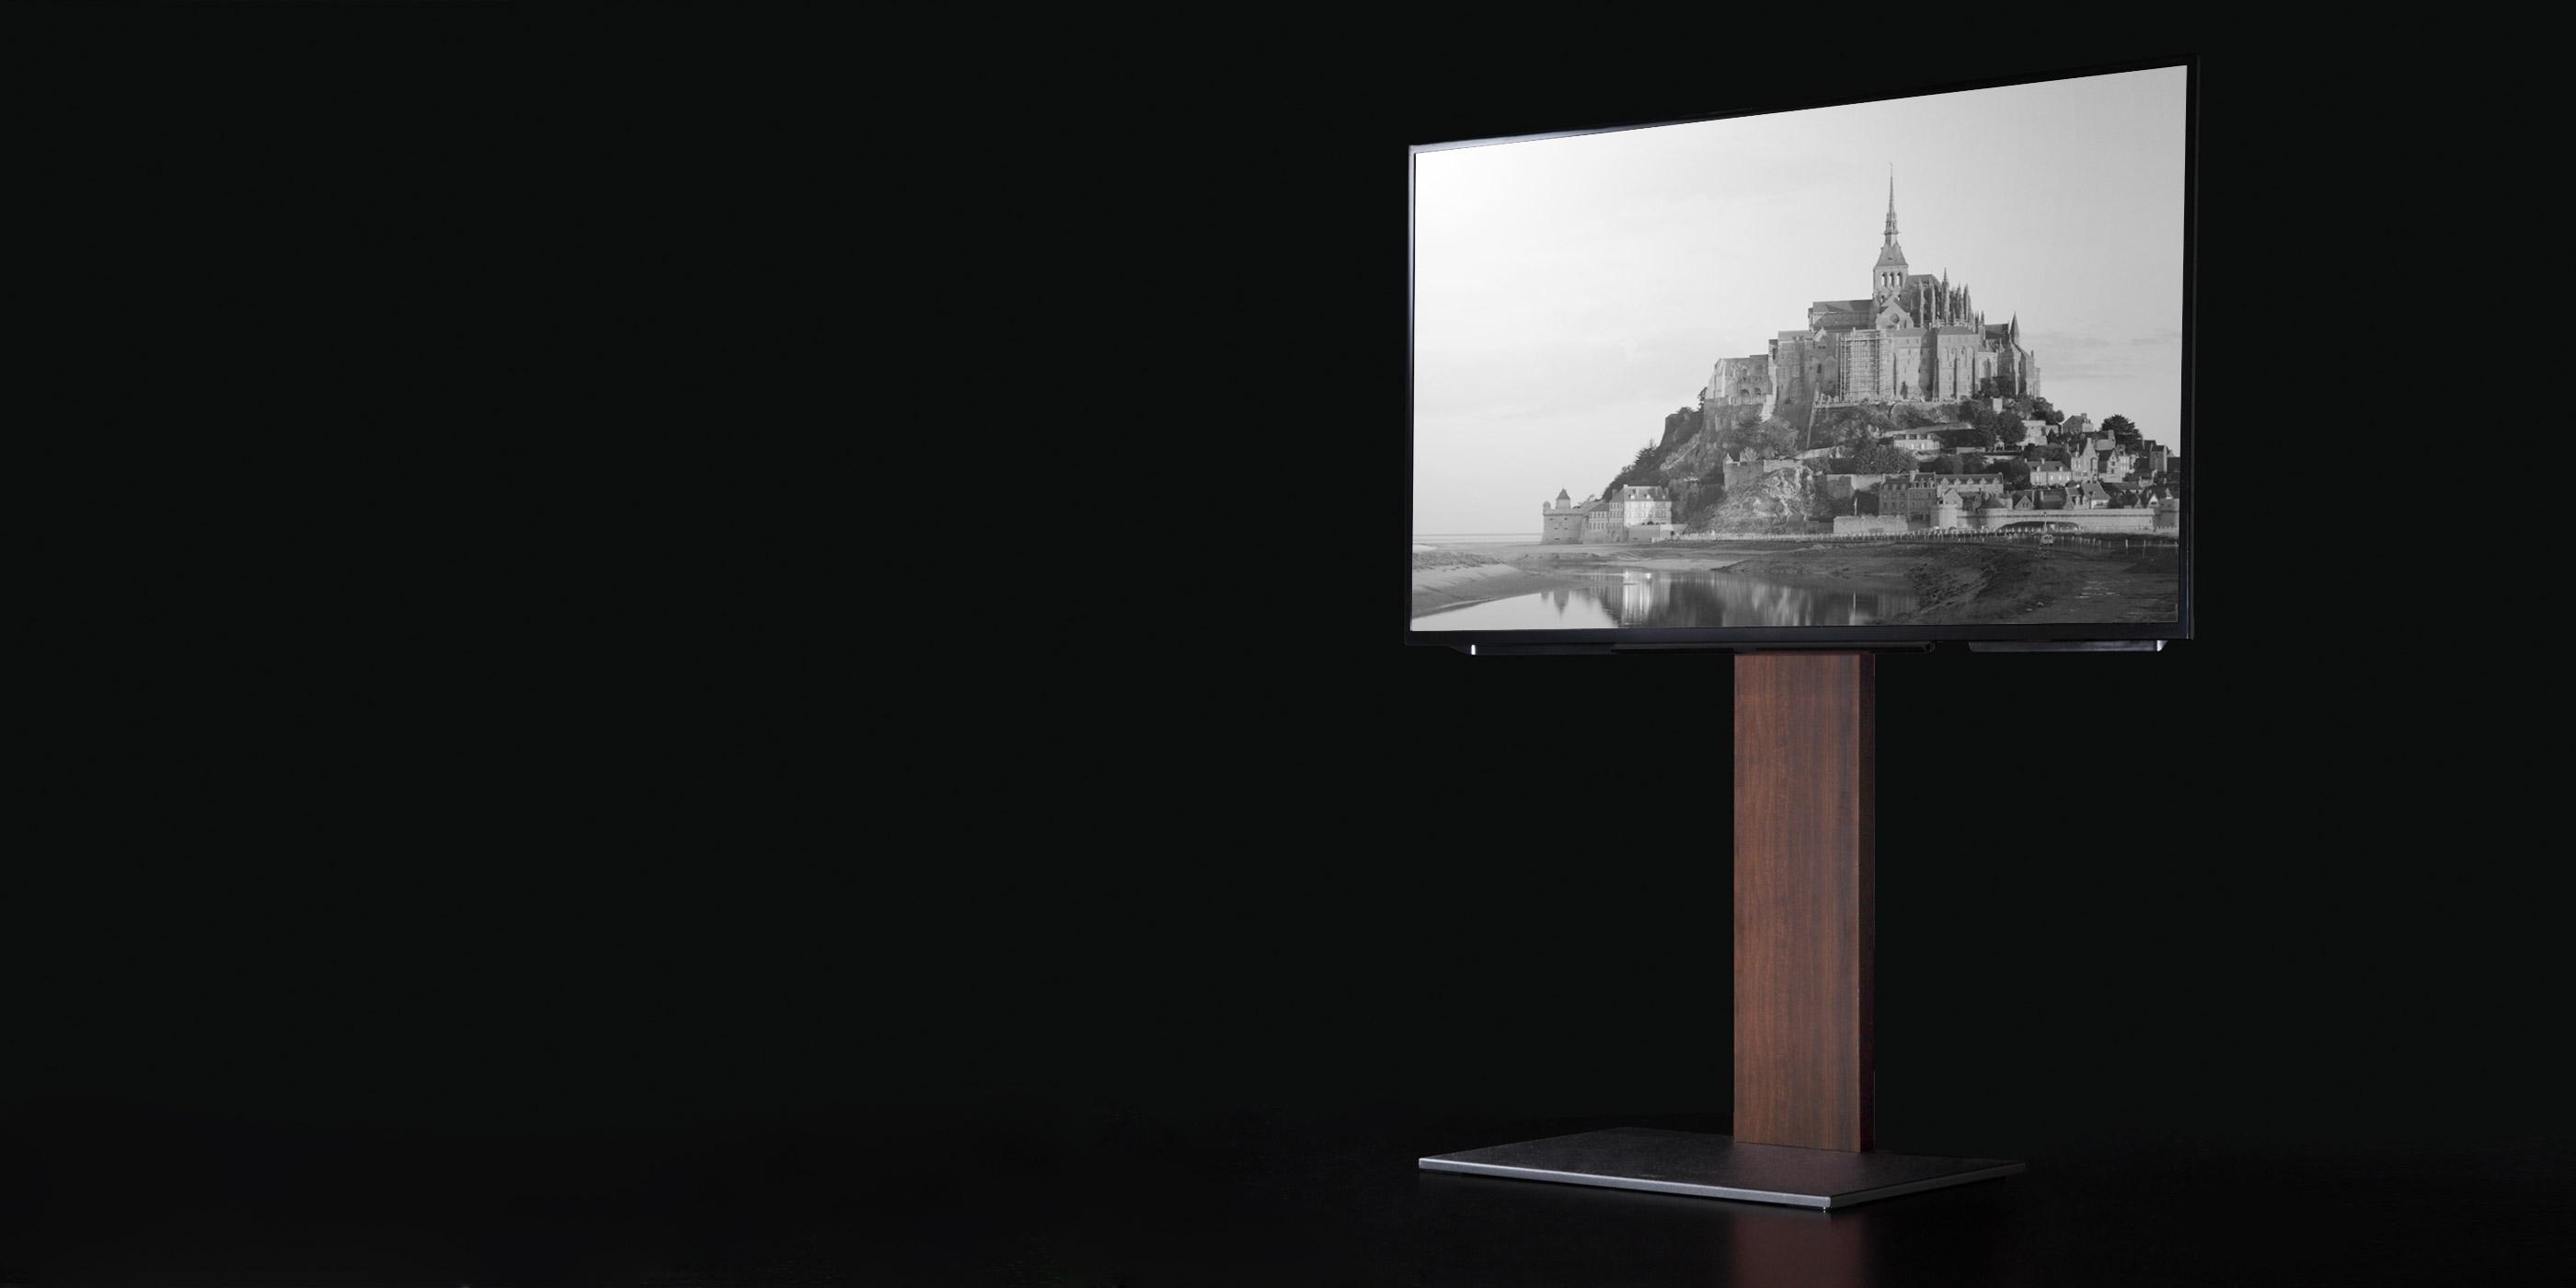 WALL INTERIOR TV STAND V2 壁寄せテレビスタンドV2